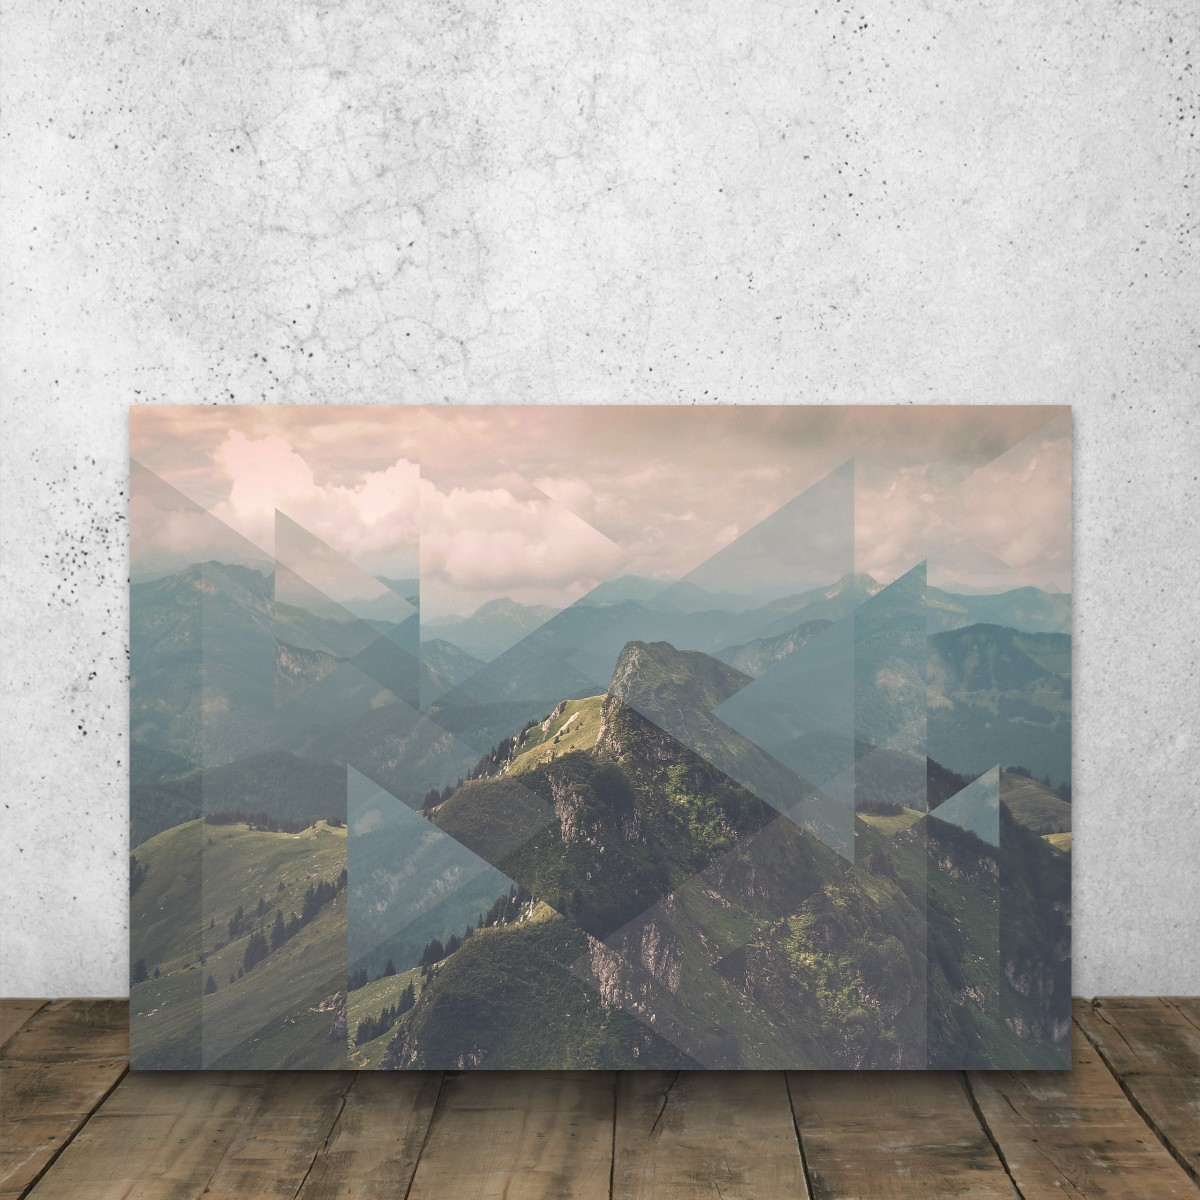 JOE MANIA / Modern Artprint Poster / Scattered Landscapes (Alps) DIN A4 - A0